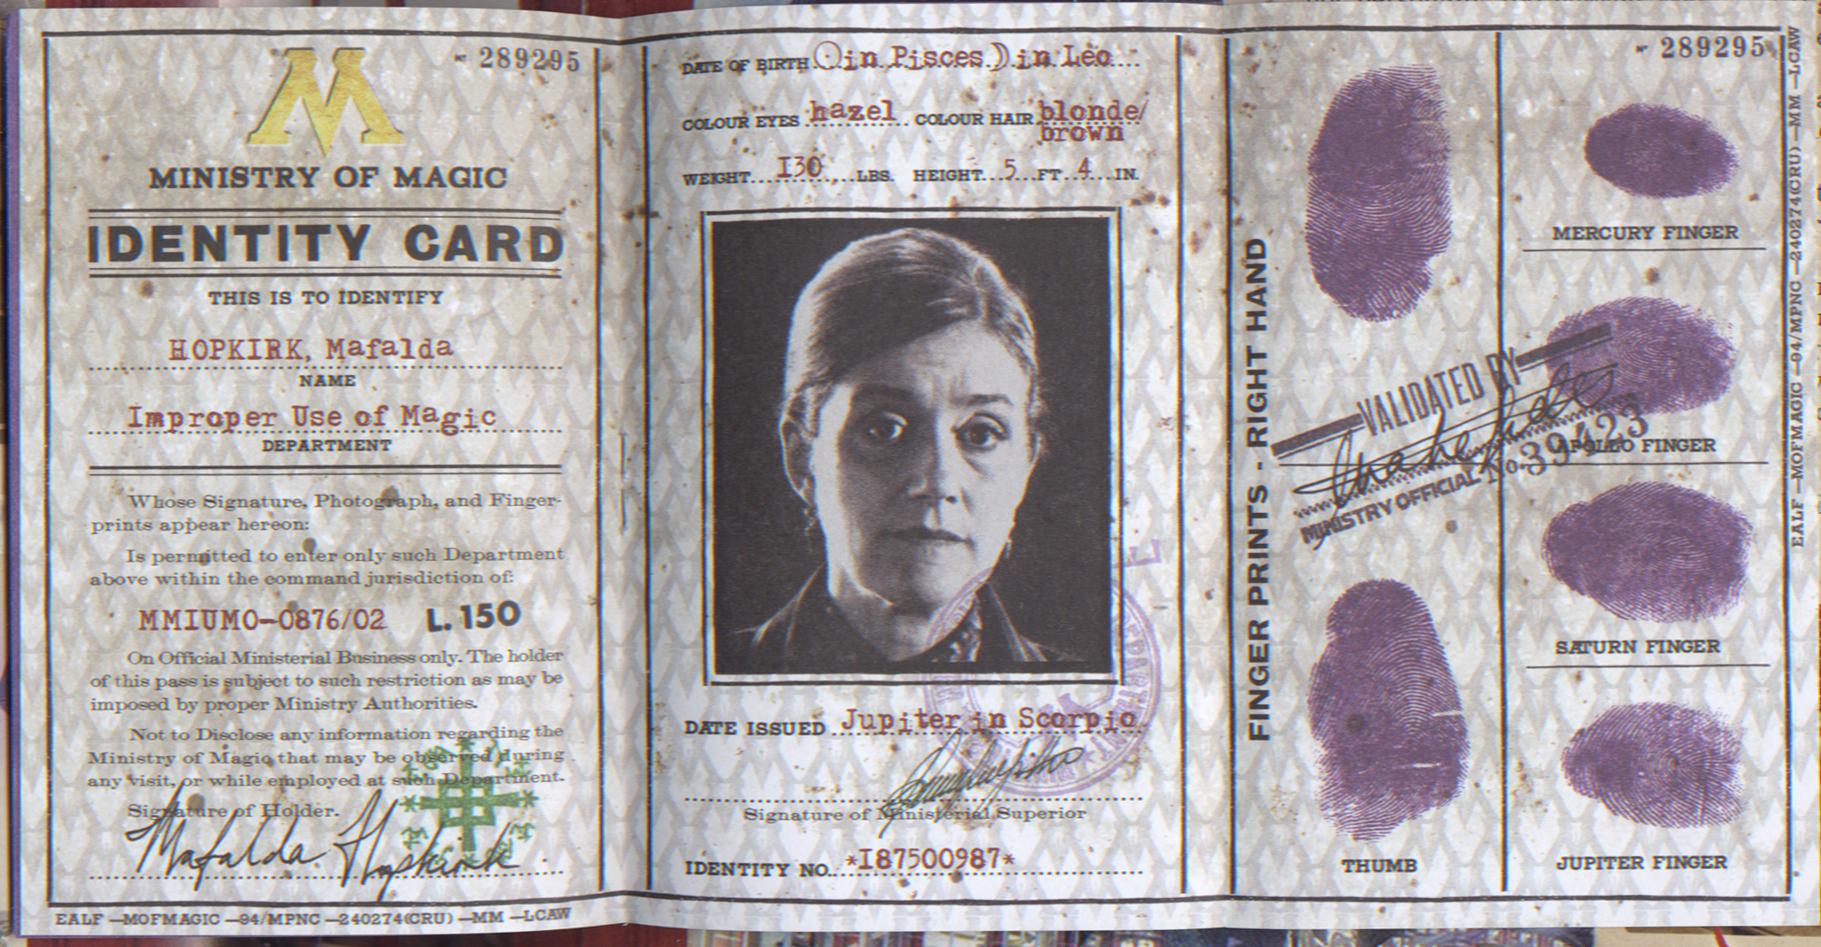 Ministry of Magic Identity Card | Harry Potter Wiki | FANDOM powered ...